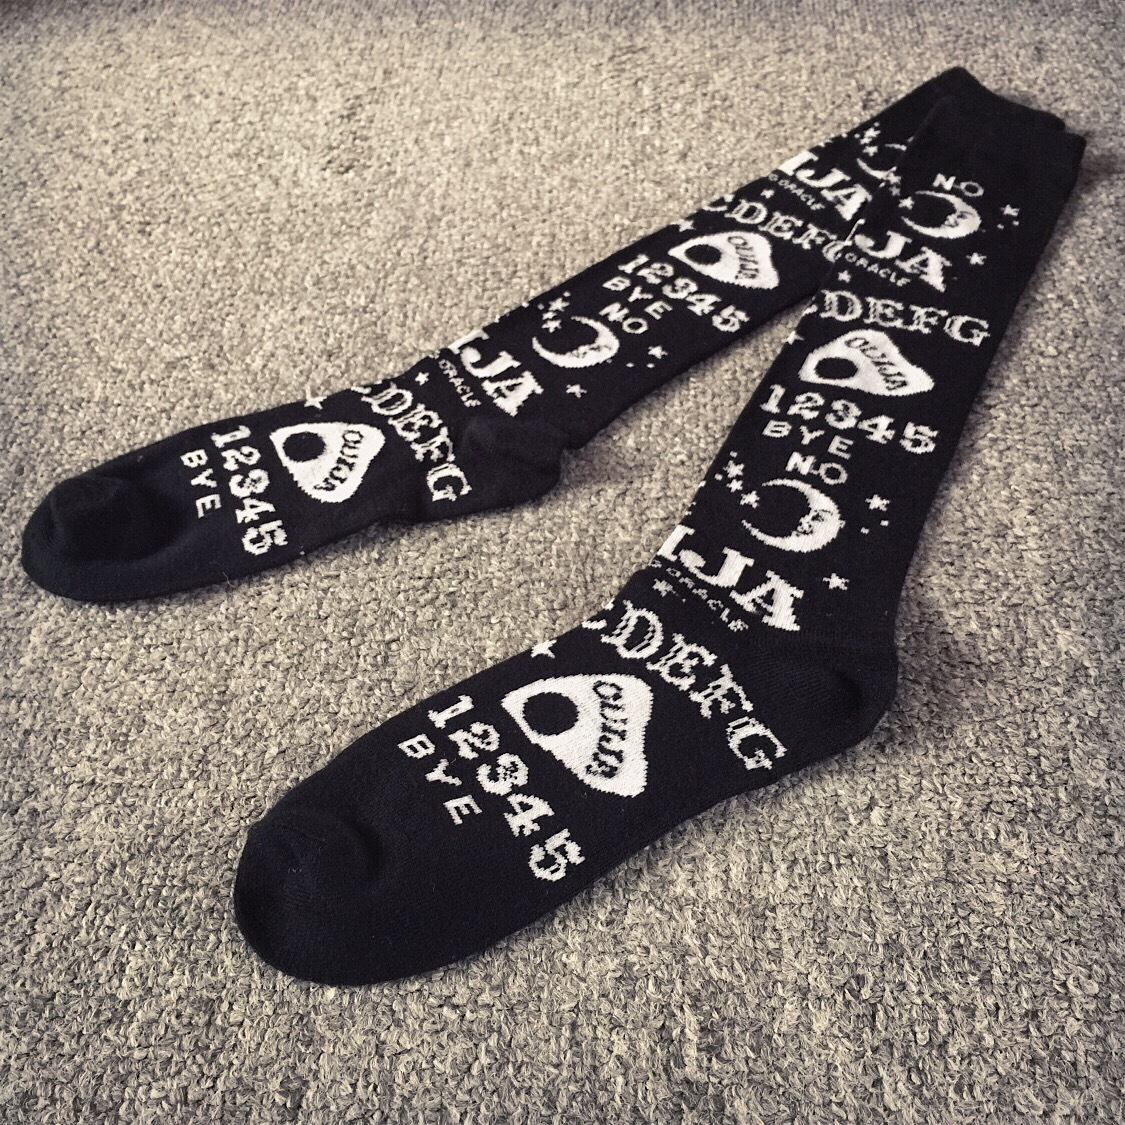 WJFXSOX new black cartoon women socks breathable absorbent cotton knee socks female personality Meias women Harajuku Hemp Socks 9